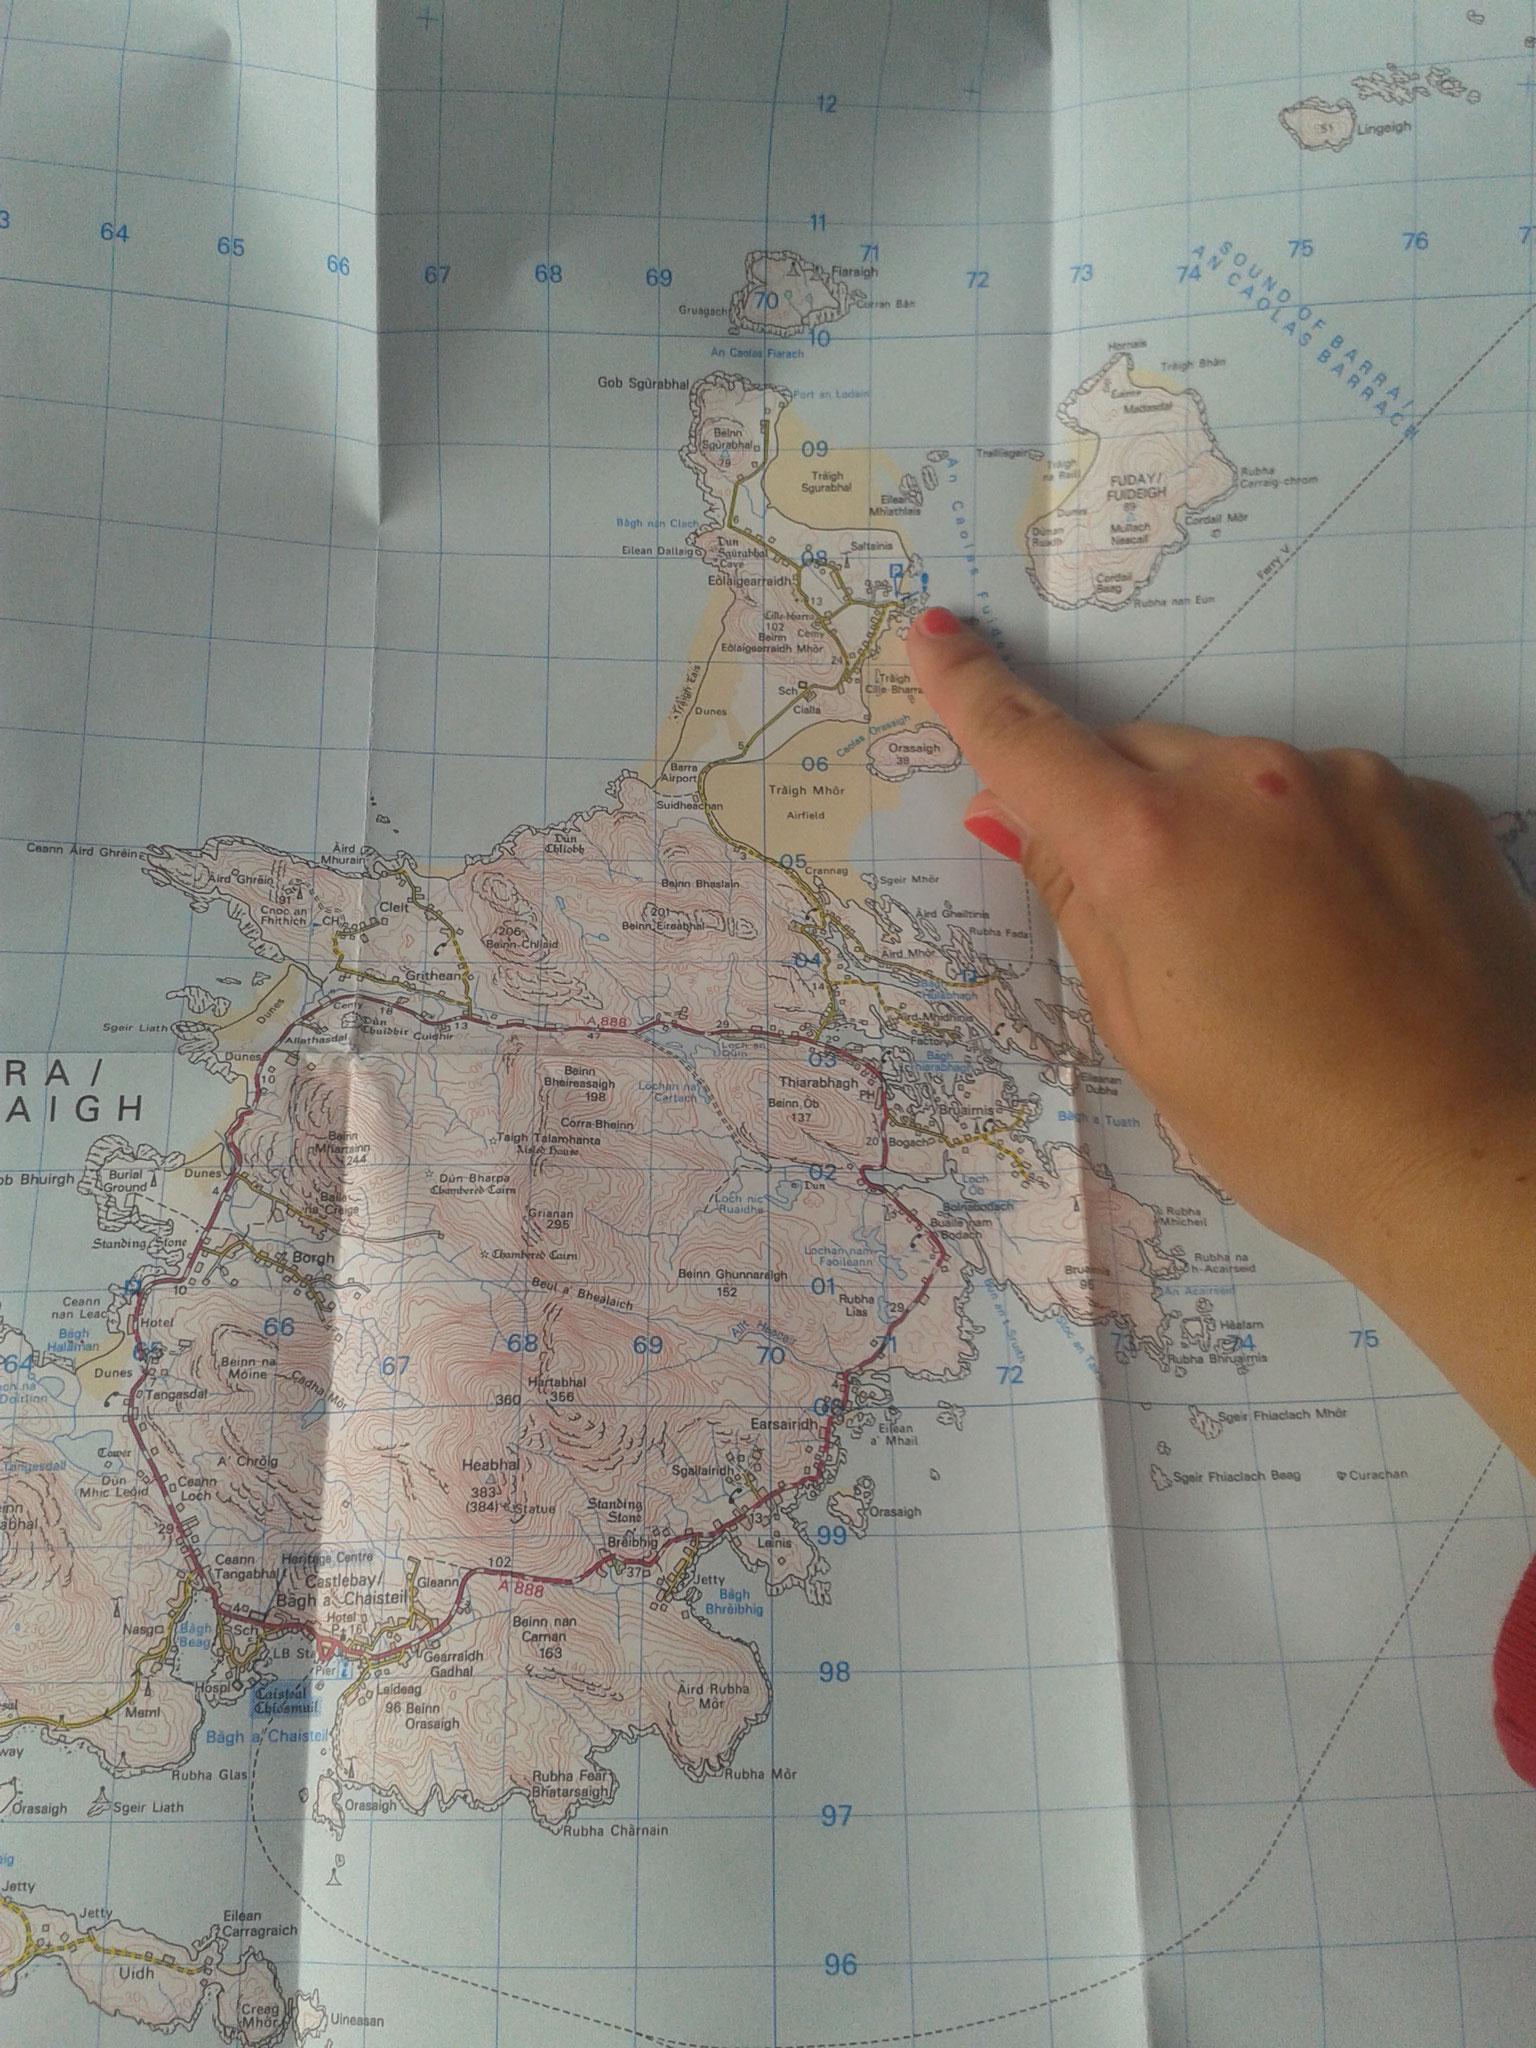 Isle of Barra_Schottland_Die Roadies_Wohnmobil_Hund_Reisetagebuch_Karte